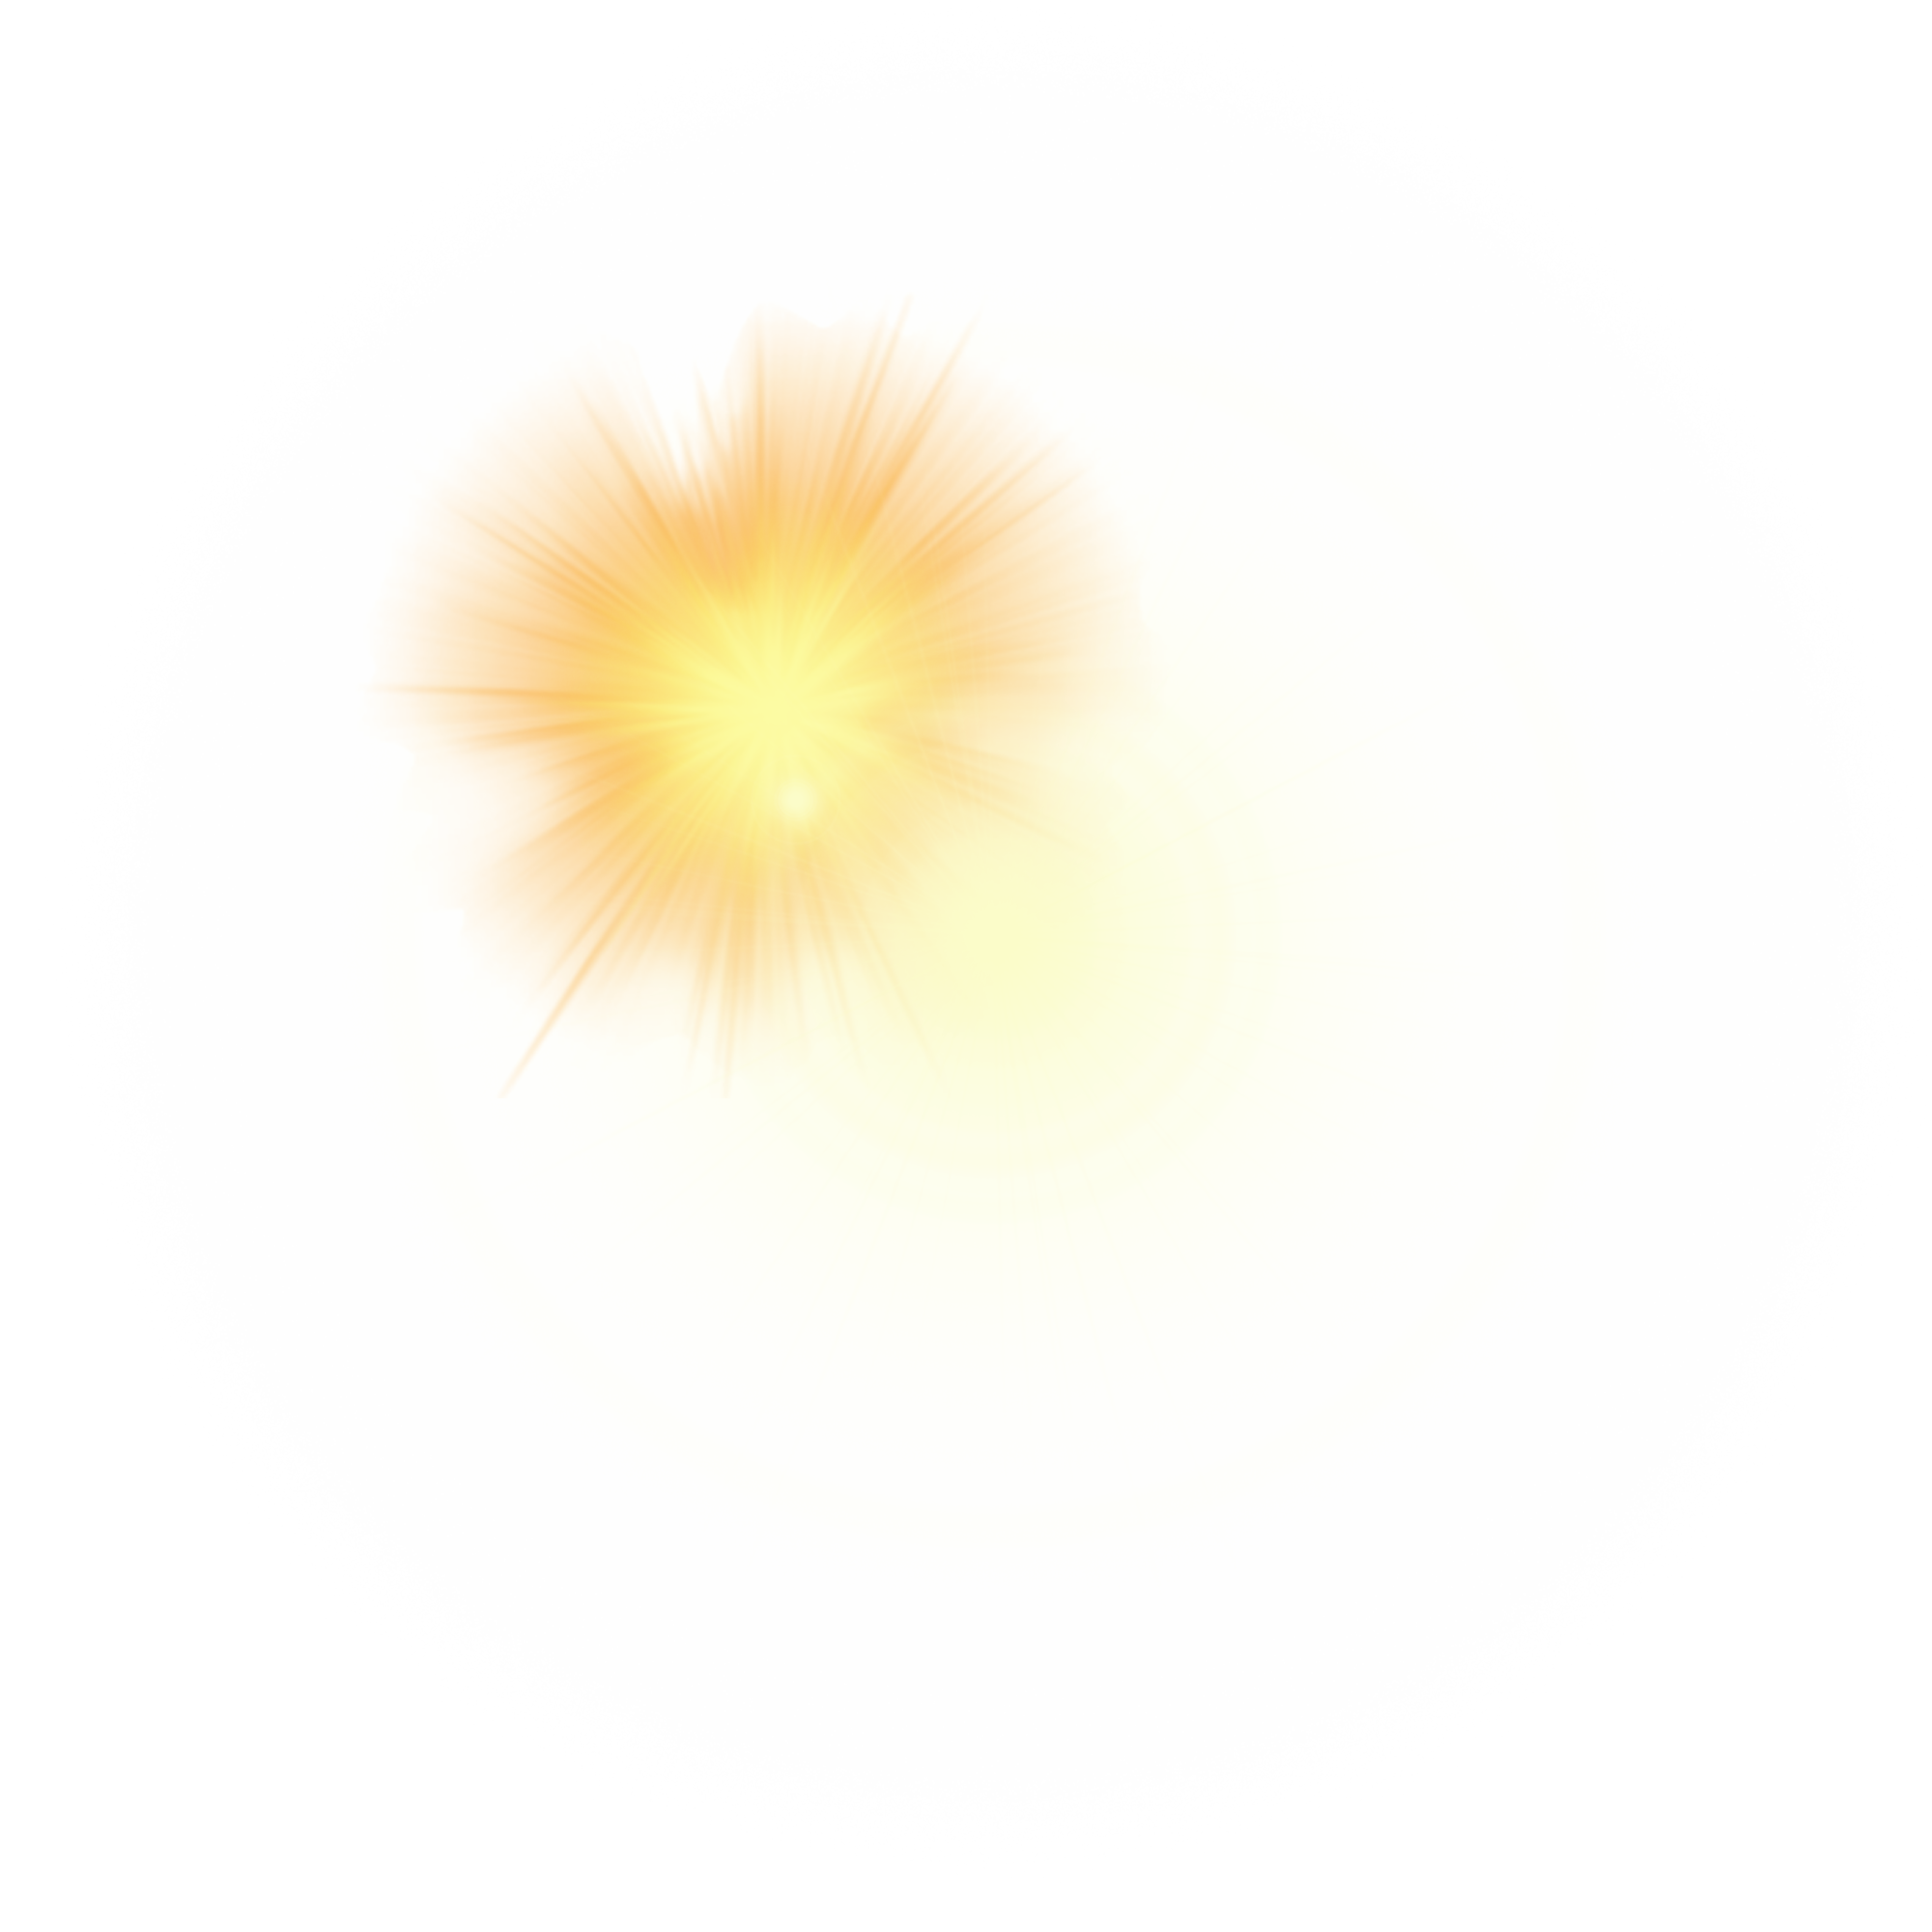 Download Efficacy Car Effect Yellow Lighting Light Luminous Clipart.